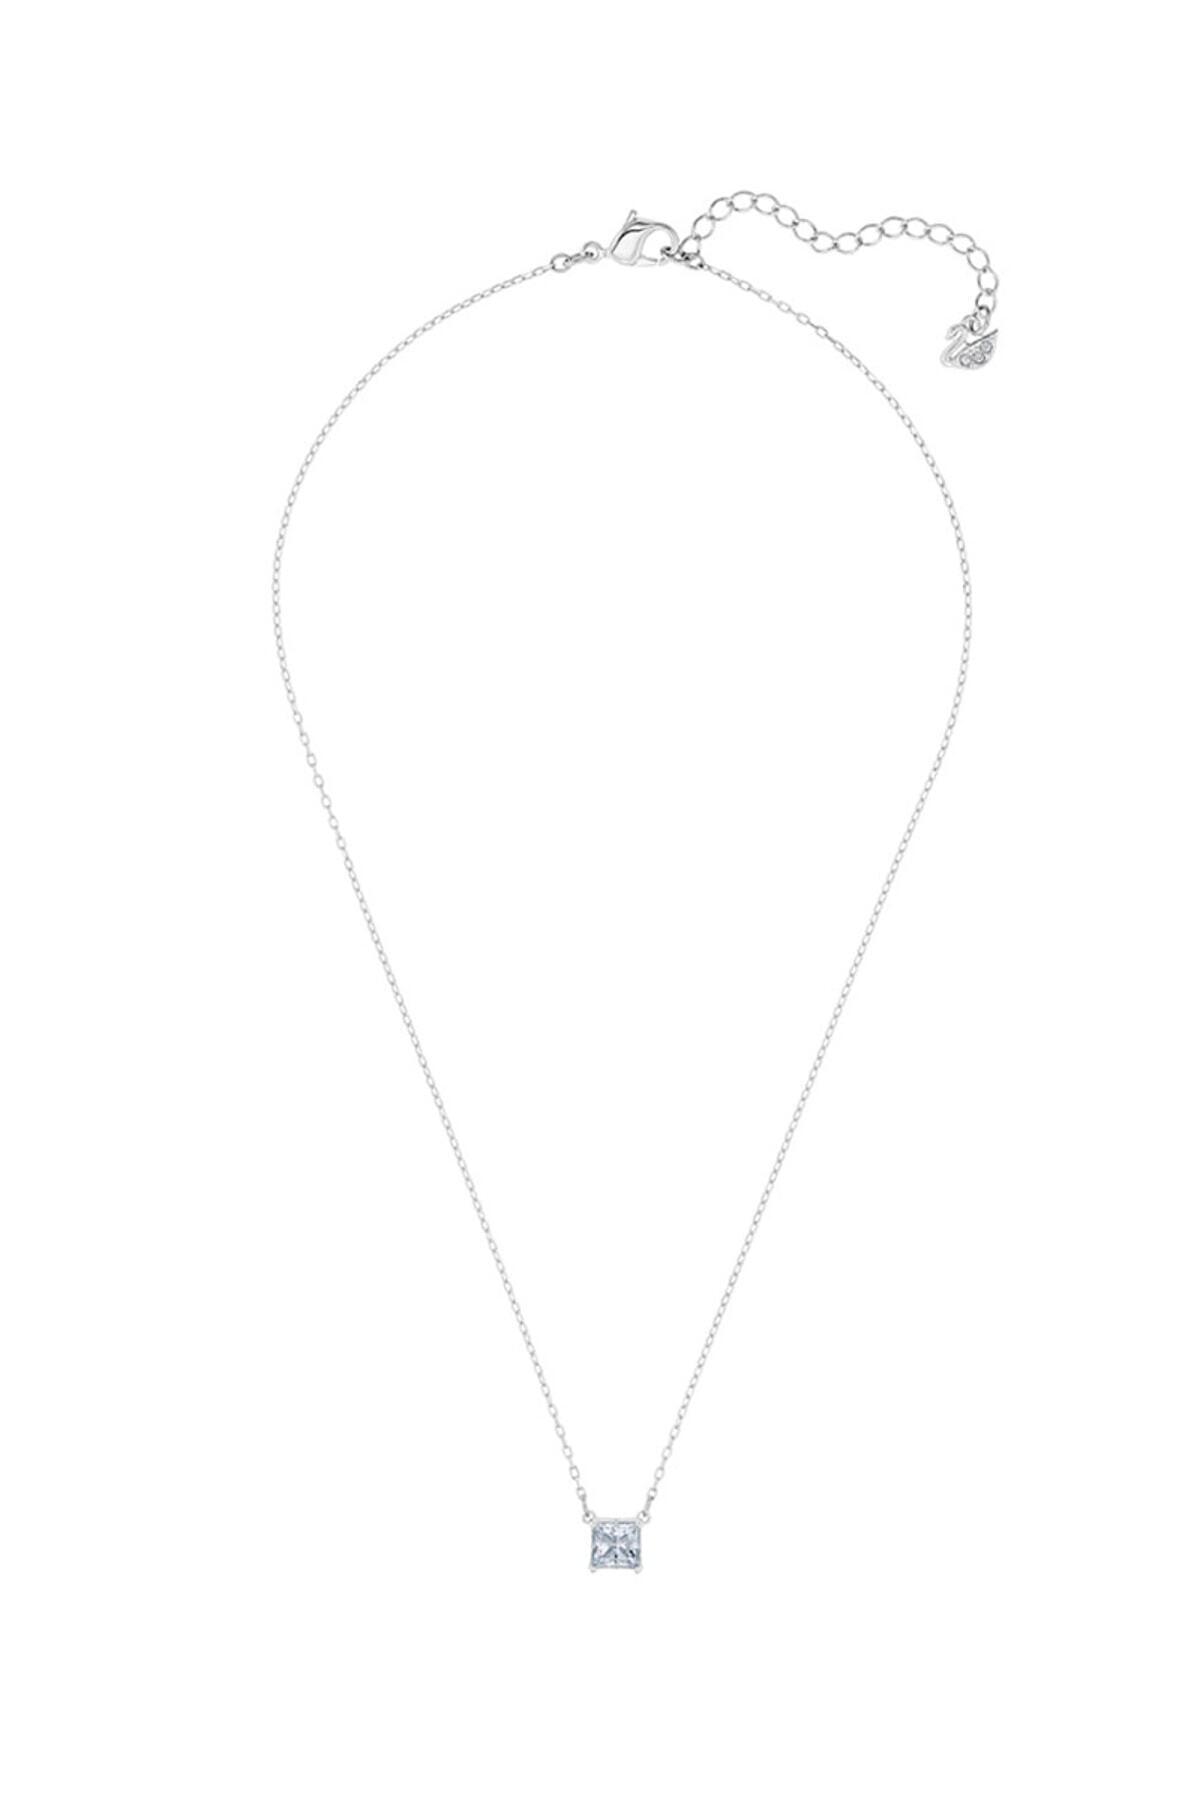 Swarovski Kolye Attract:Necklace Sq Czwh/Rhs 5510696 2